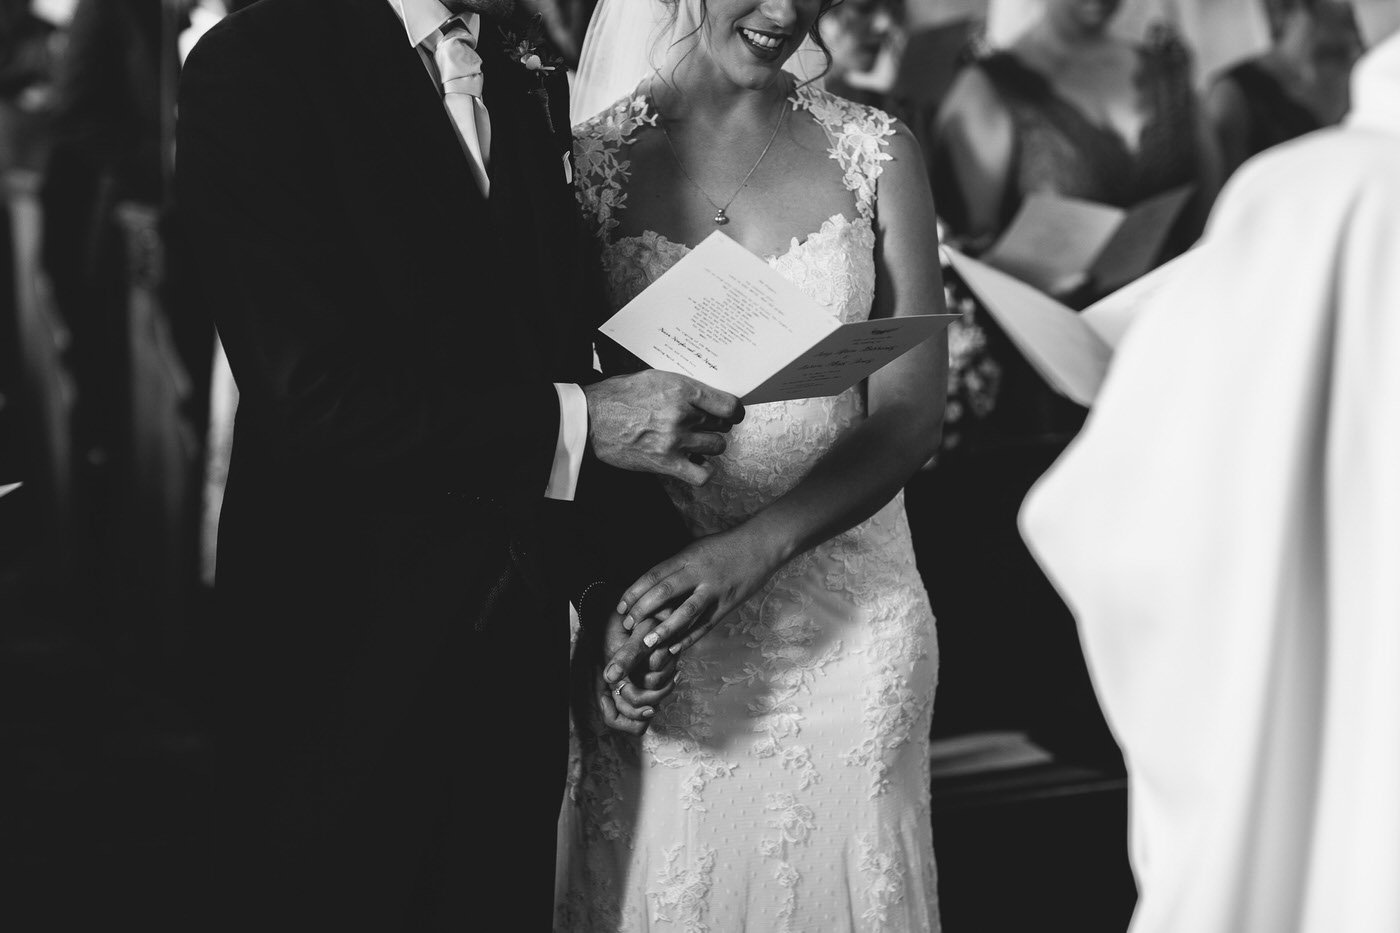 AA PENTREMAWRNORTH WALES WEDDING 1481